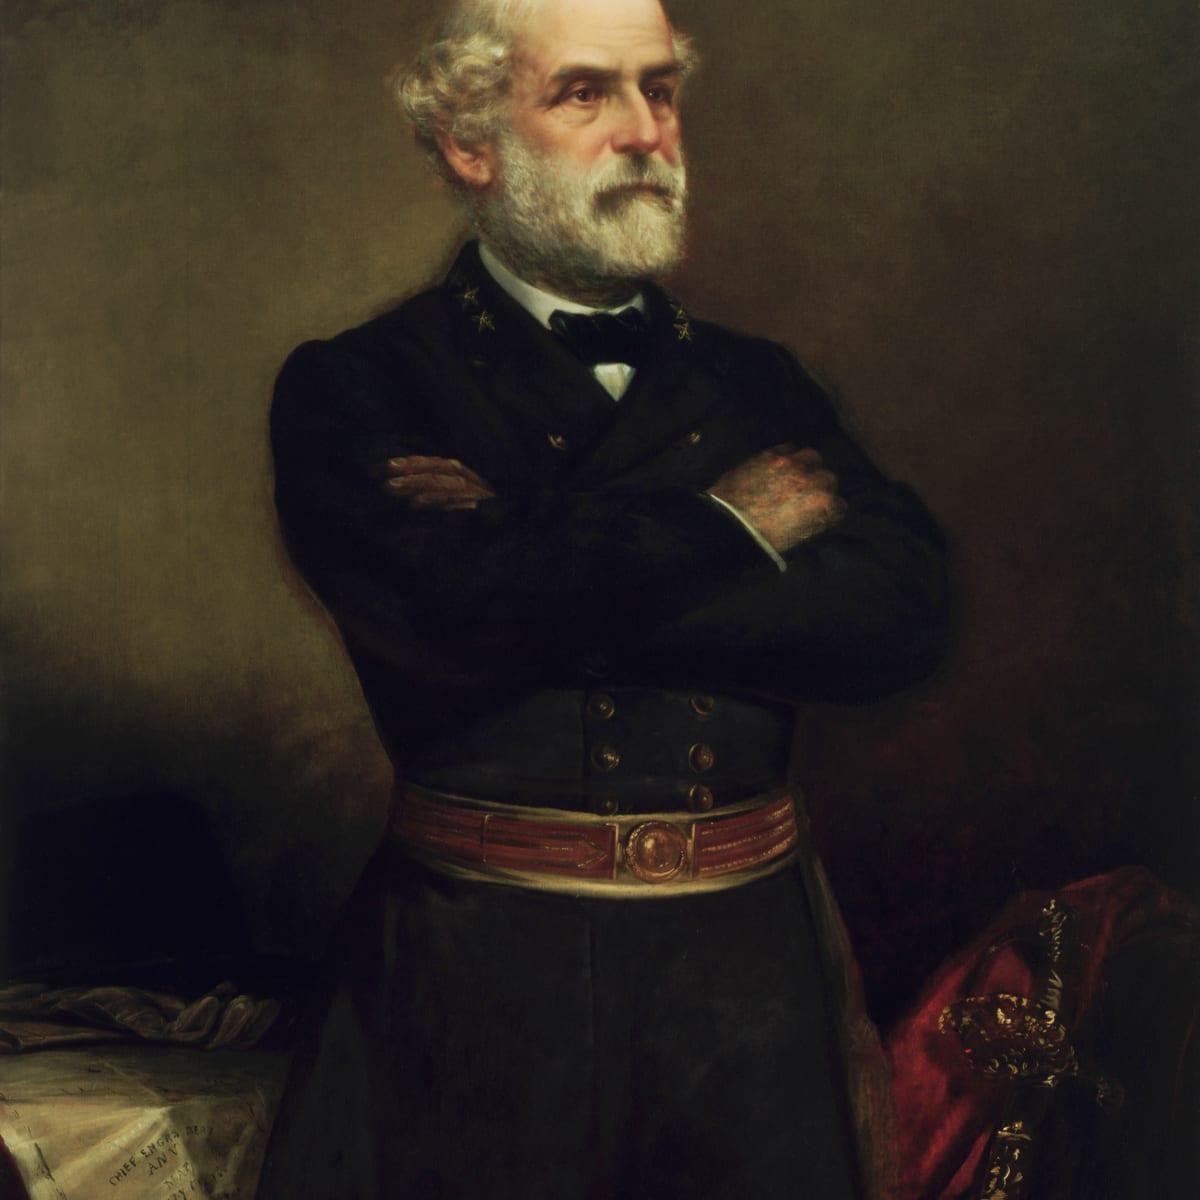 26 Robert E Lee Portrait